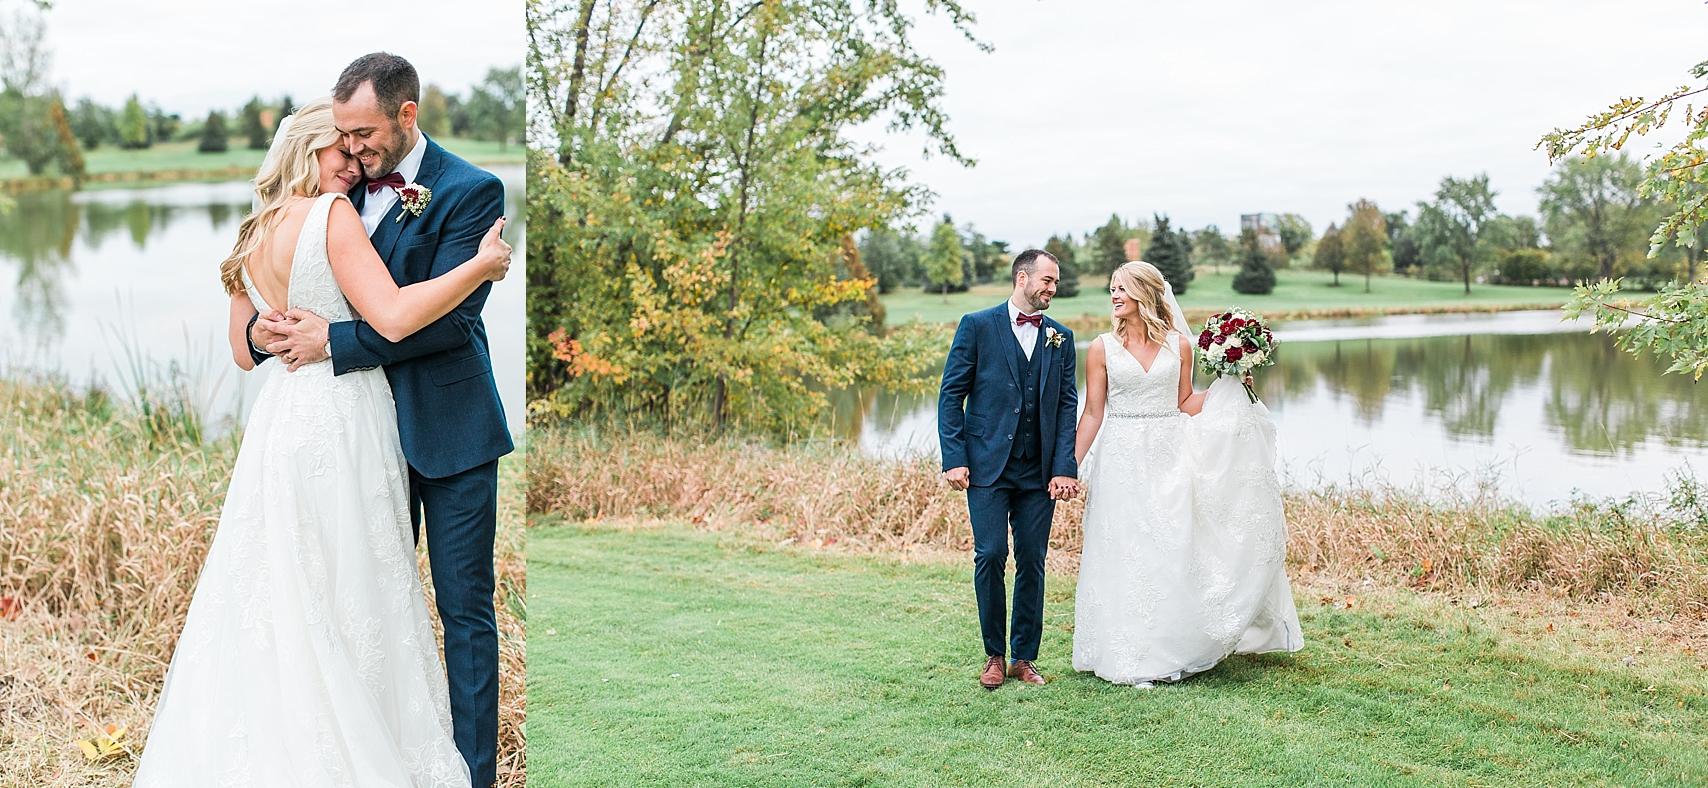 Minnesota Minneapolis Wedding Photographer Best Of 2018 Weddings Mallory Kiesow Photography_0179.jpg